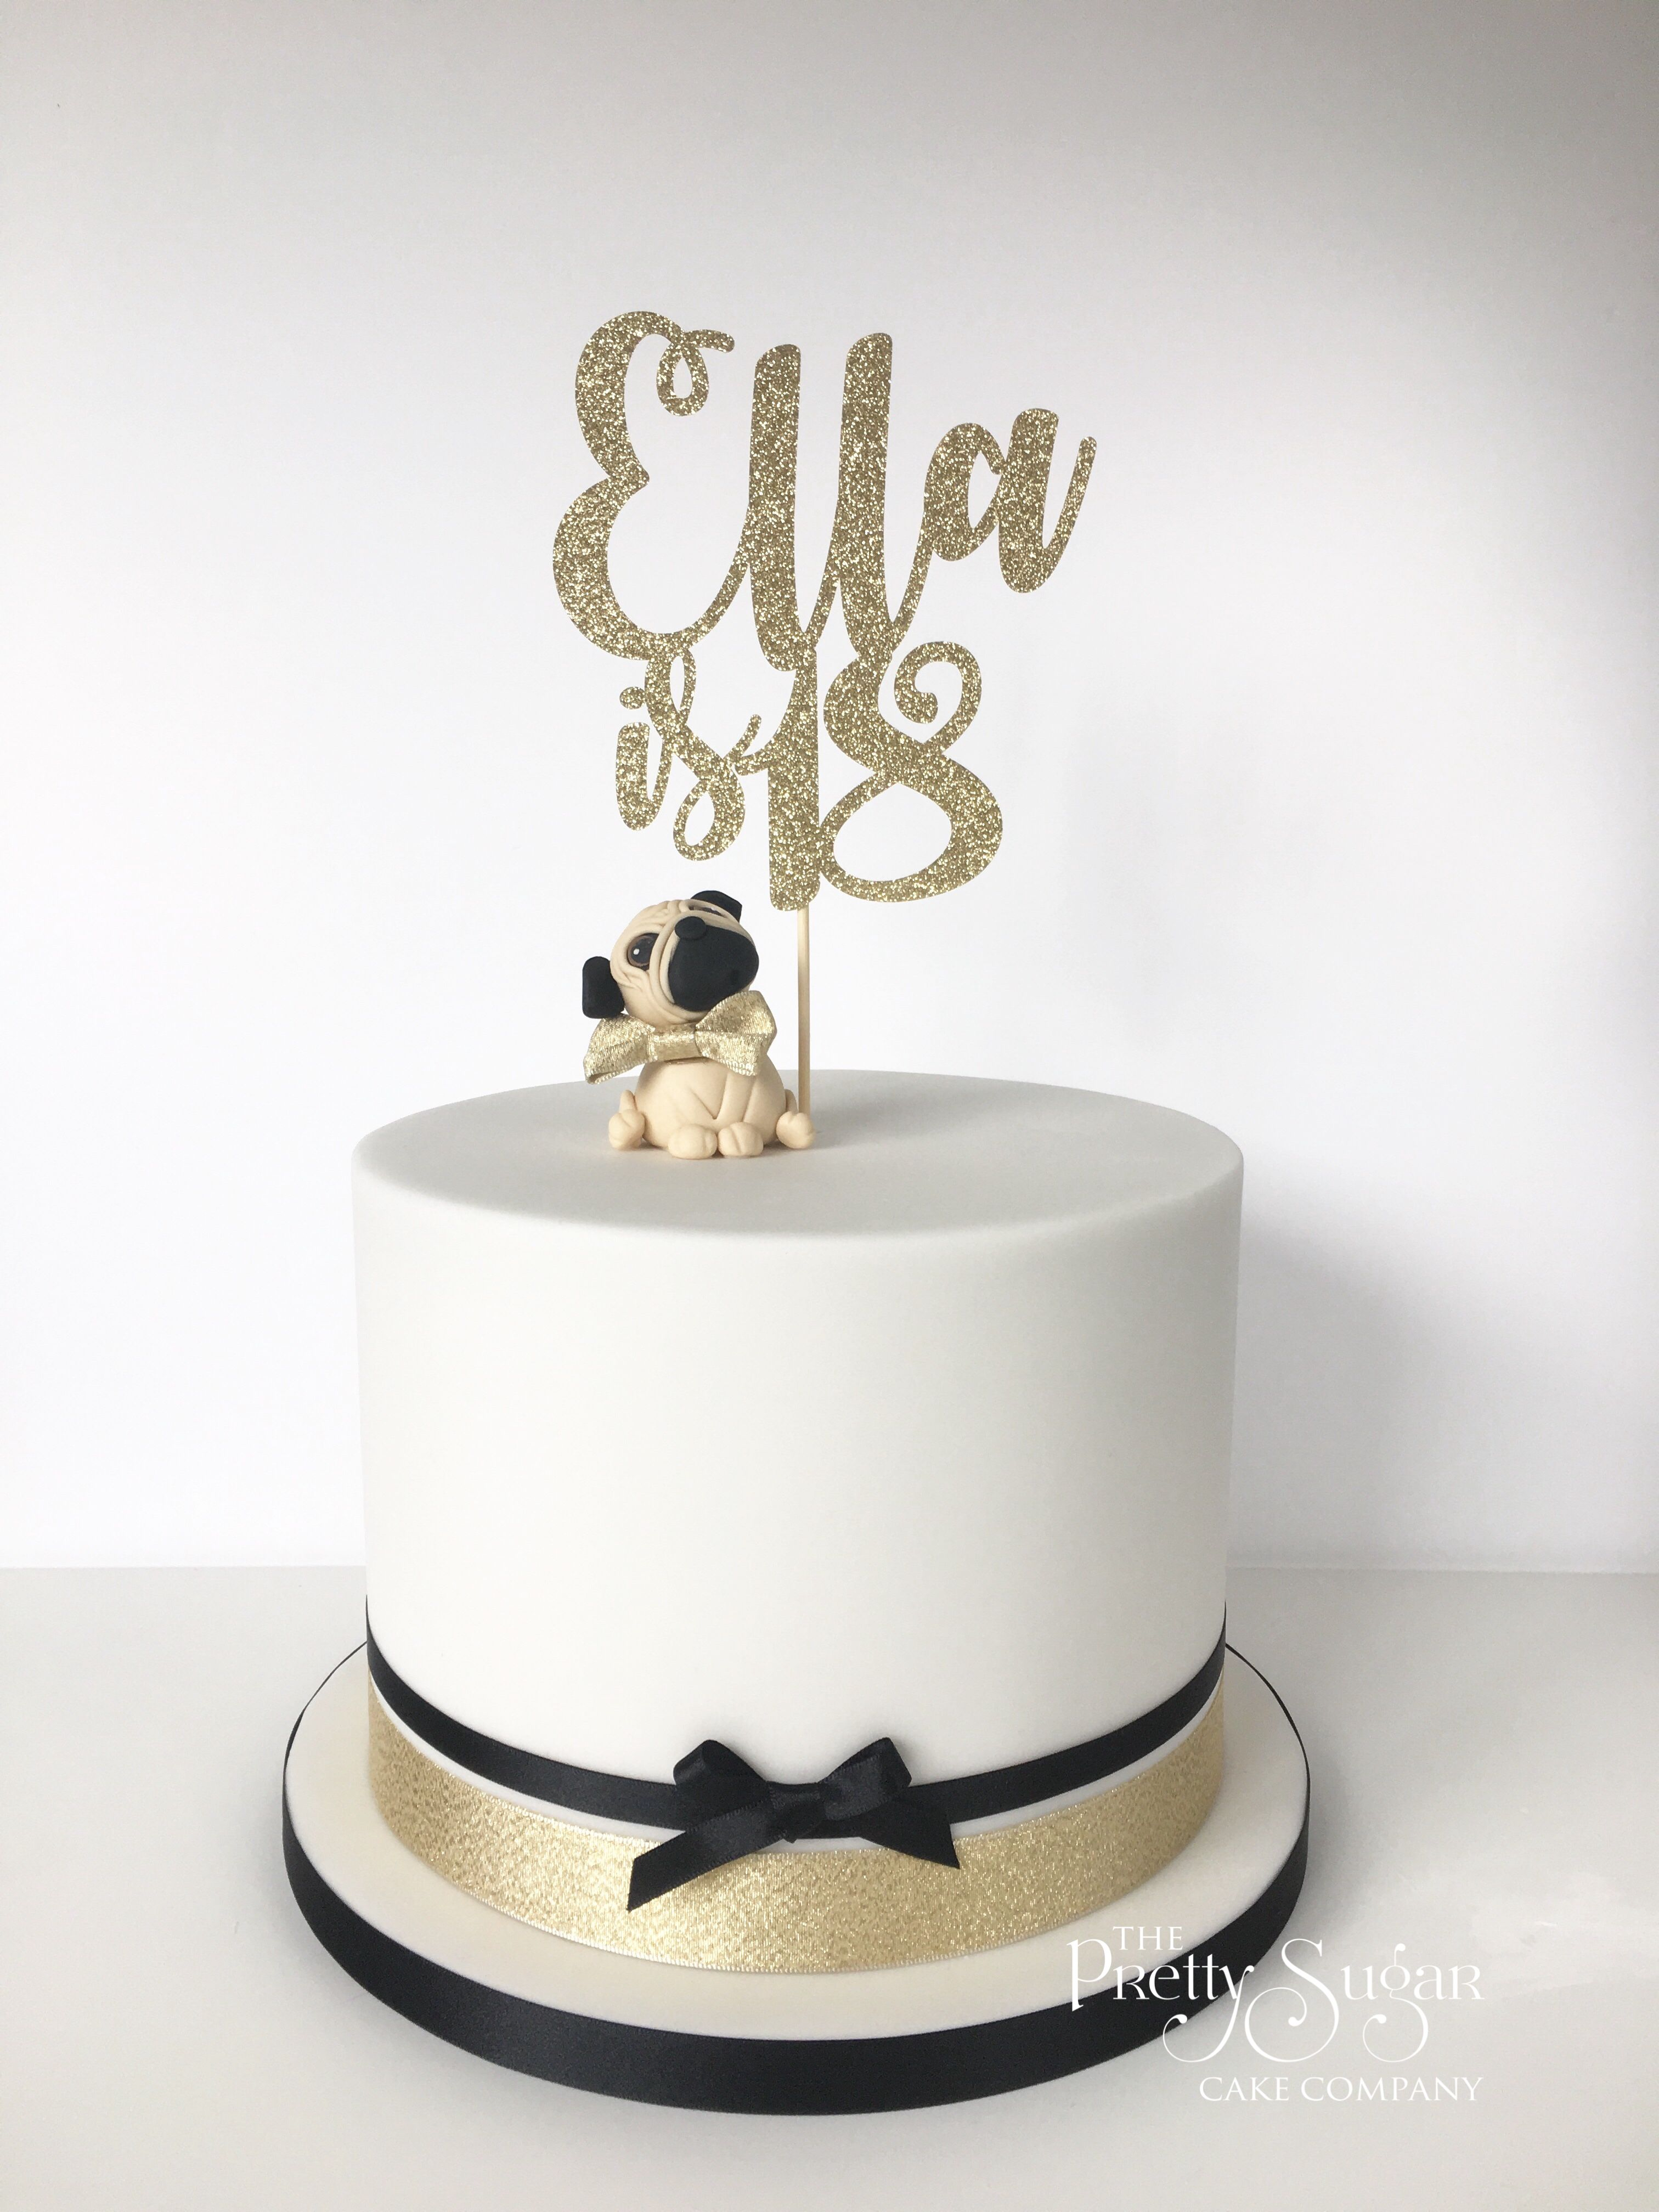 Pleasing Pug 18Th Birthday Cake Modern Birthday Cakes Pug Birthday Cake Funny Birthday Cards Online Bapapcheapnameinfo